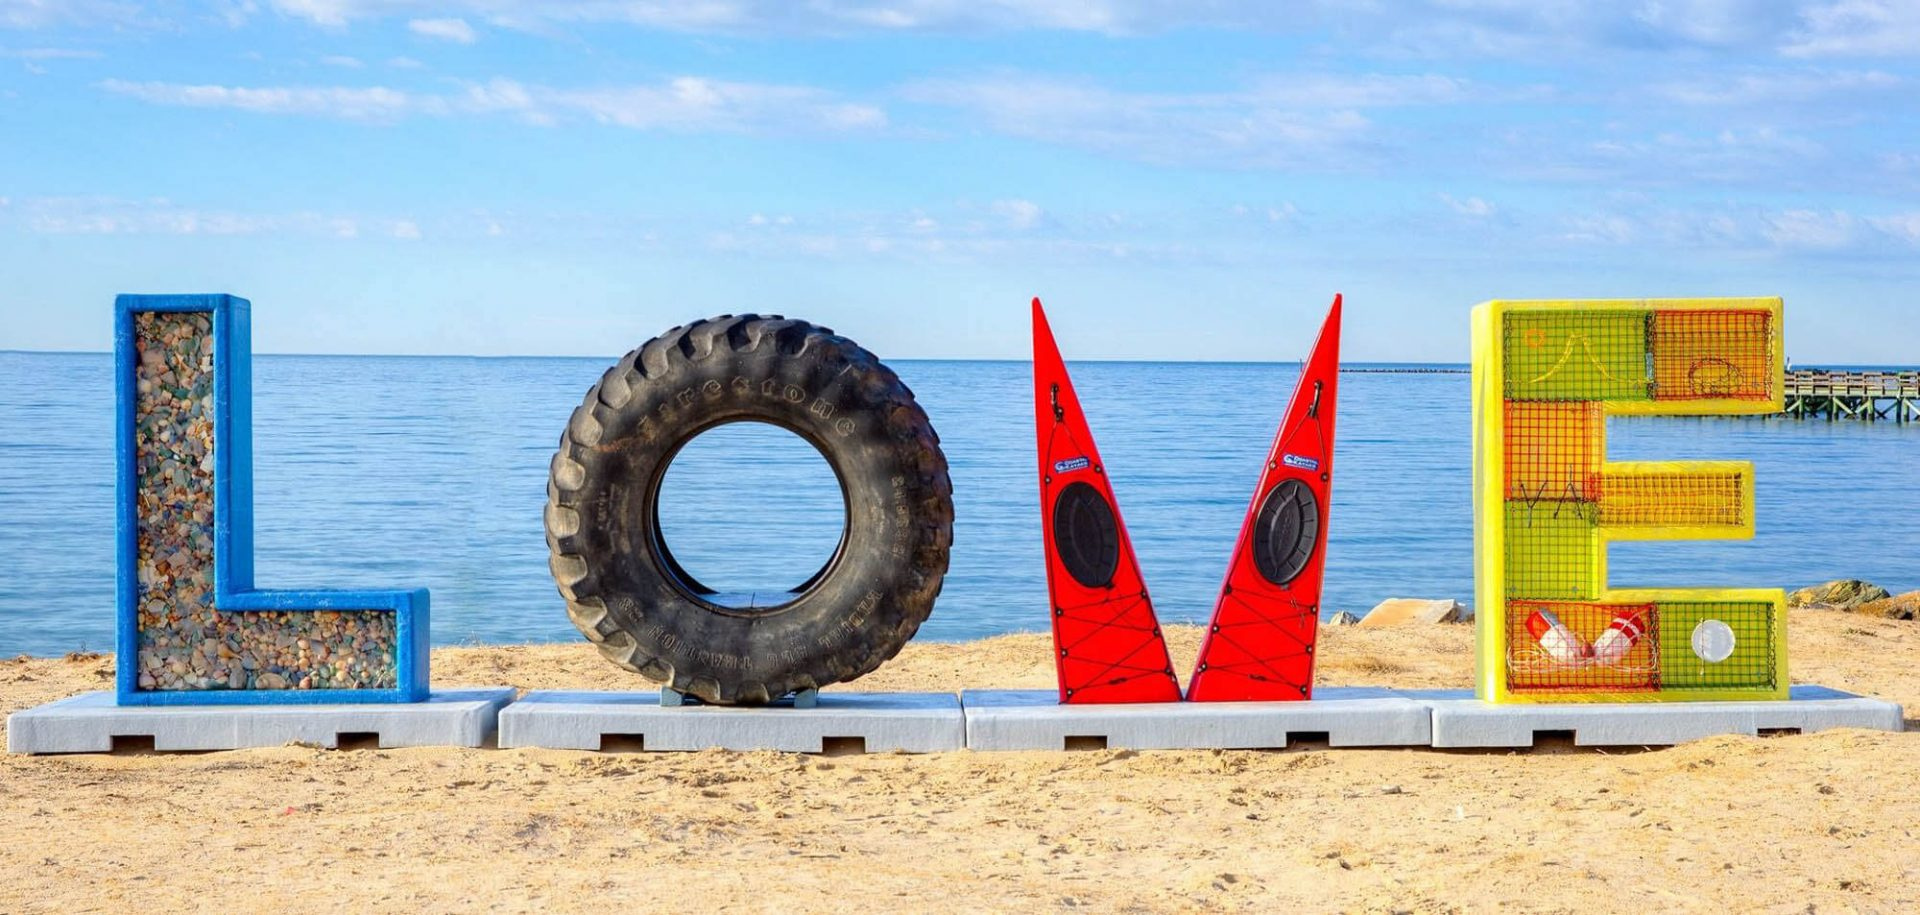 Huge LOVE sign at beach